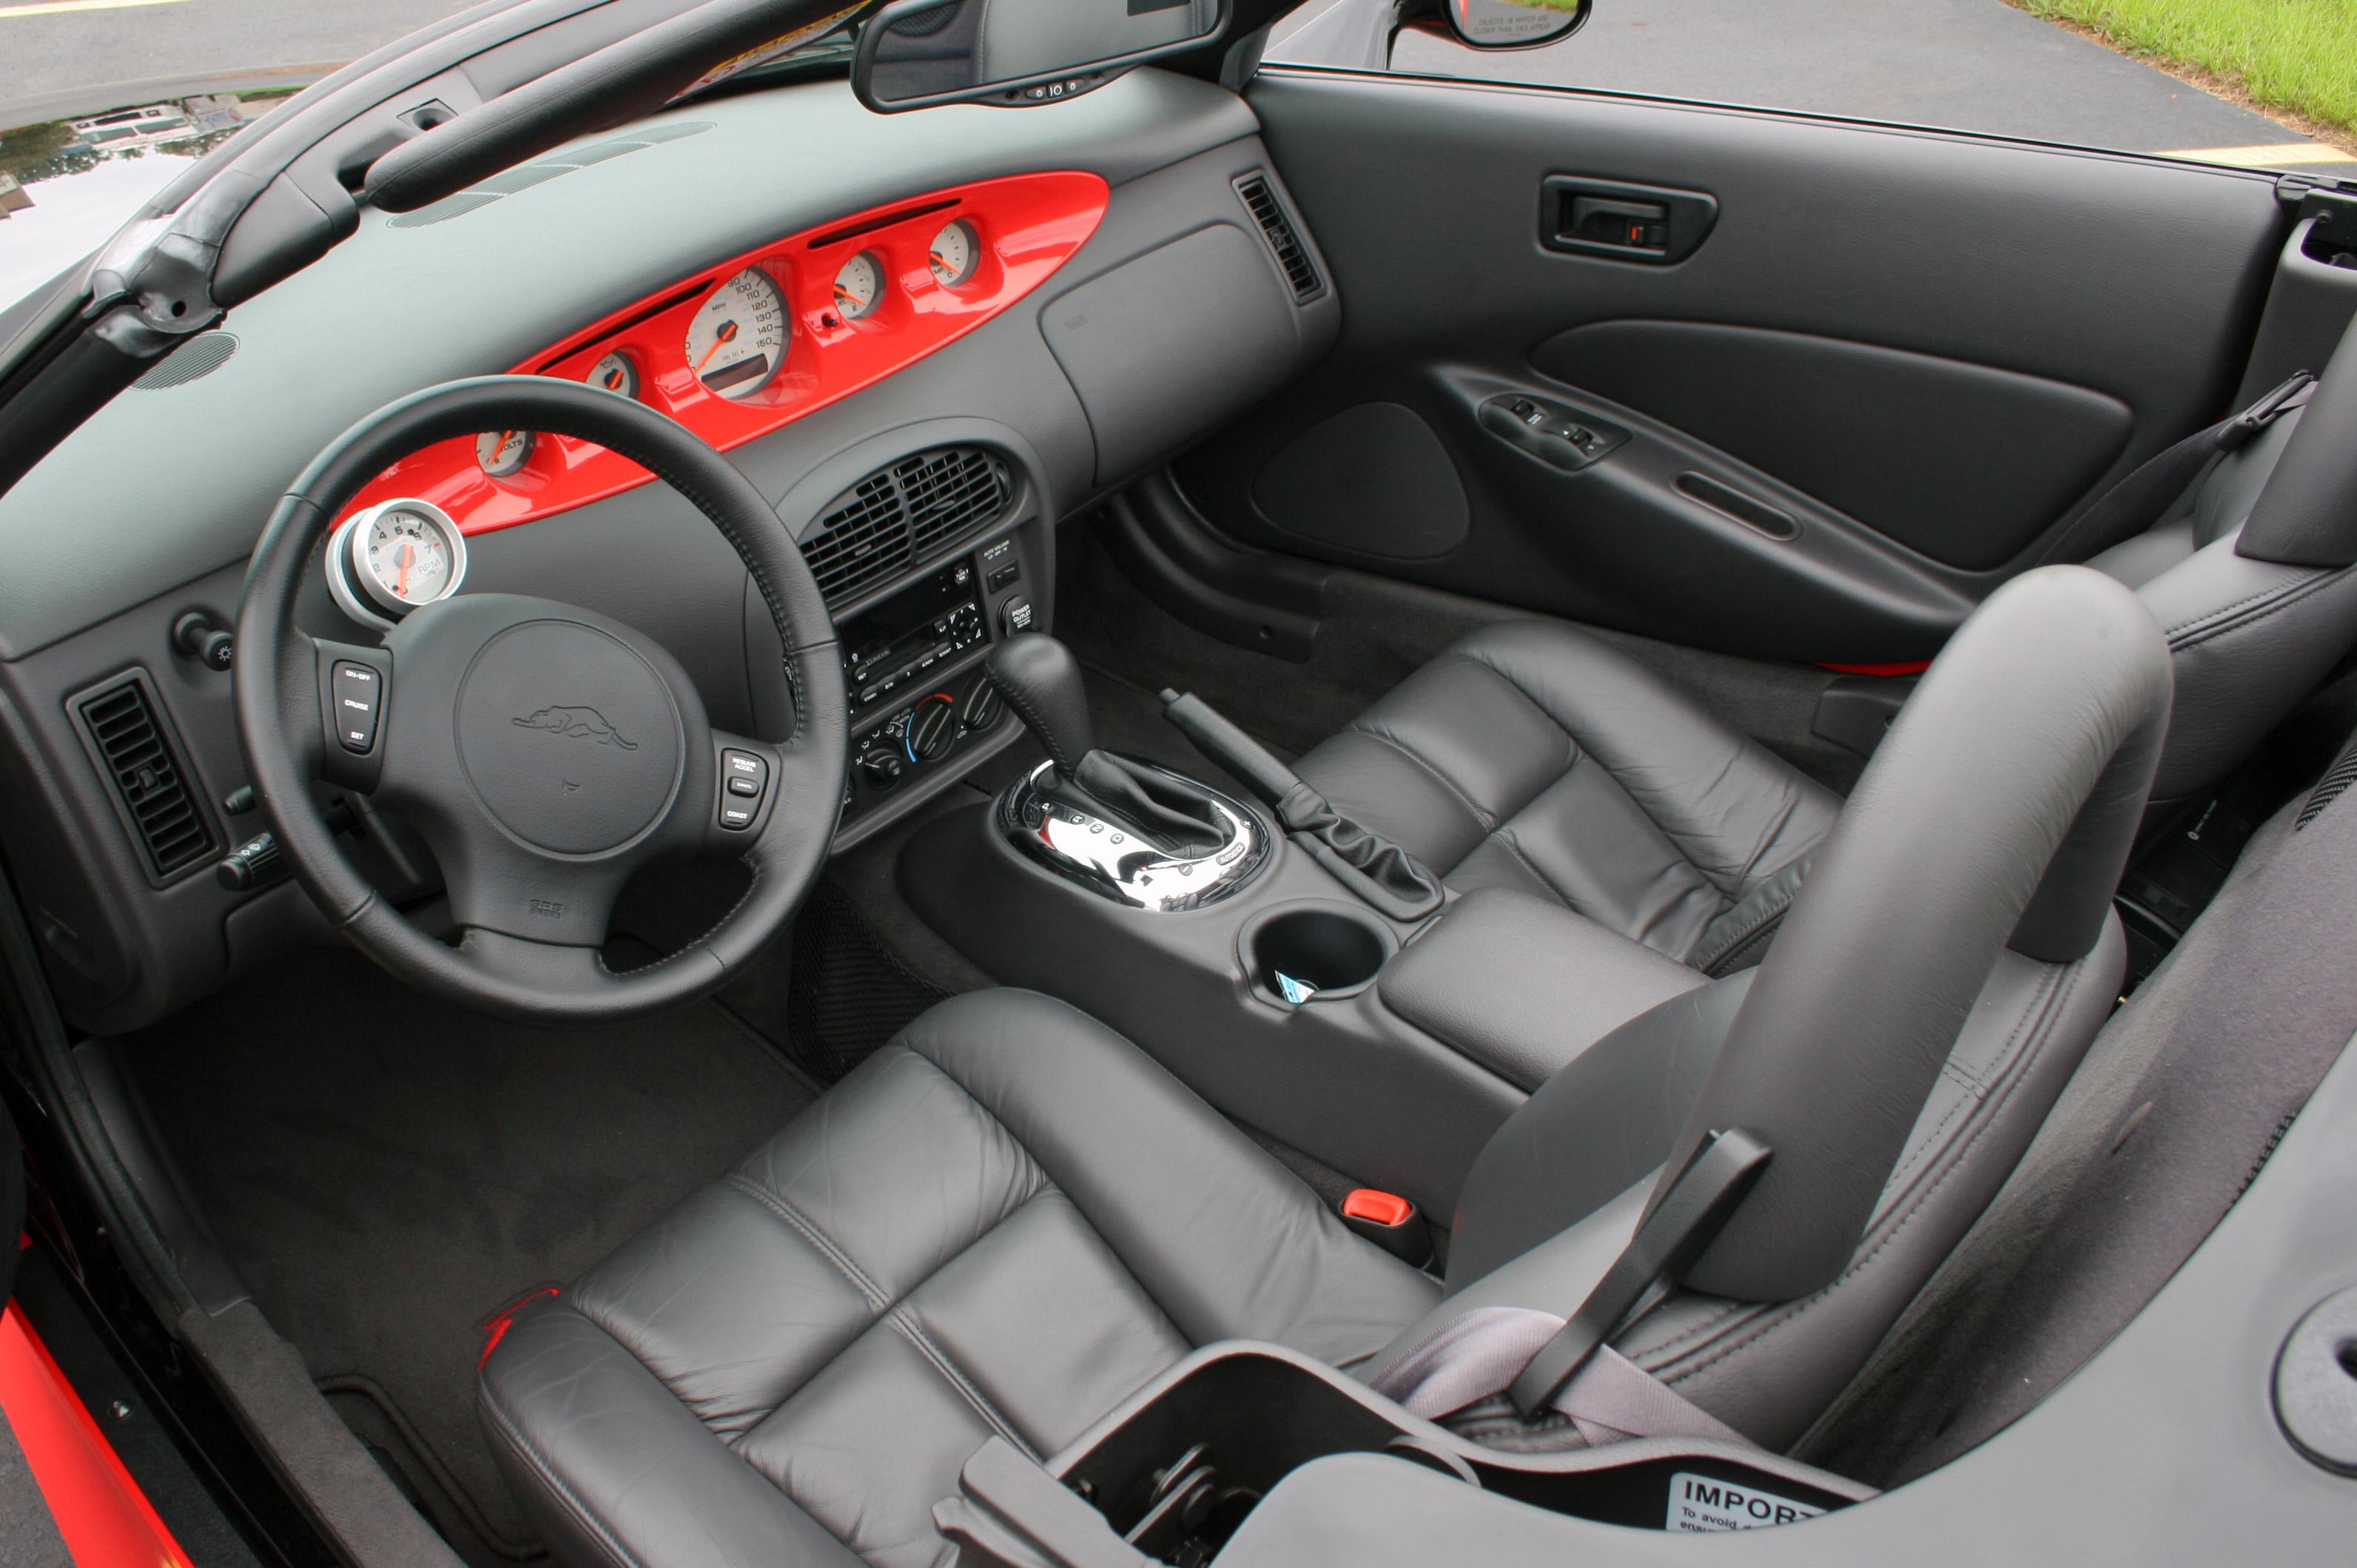 Plymouth Prowler on 2002 Pontiac Montana Interior